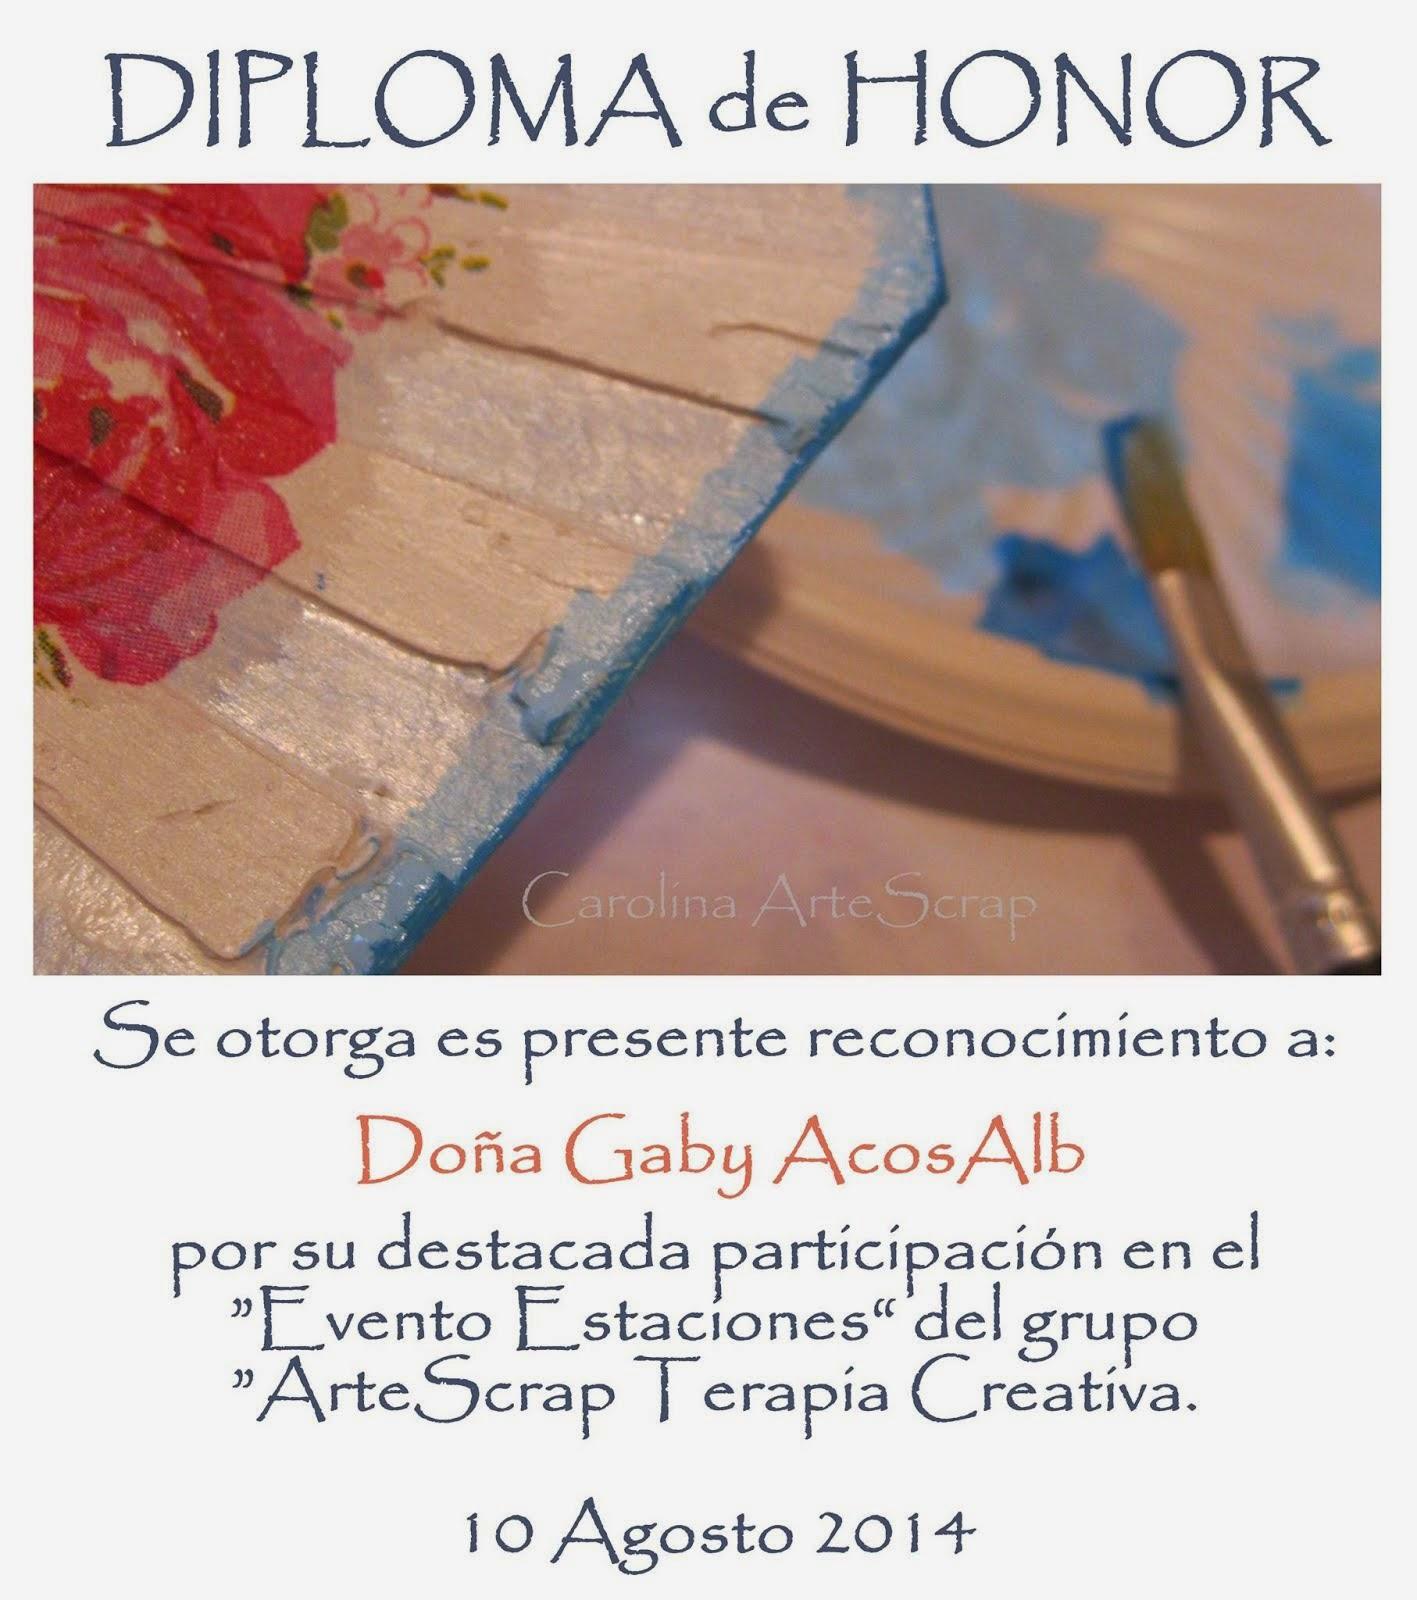 Mi diploma de honor por parte de Carolina ArteScrap 2.0